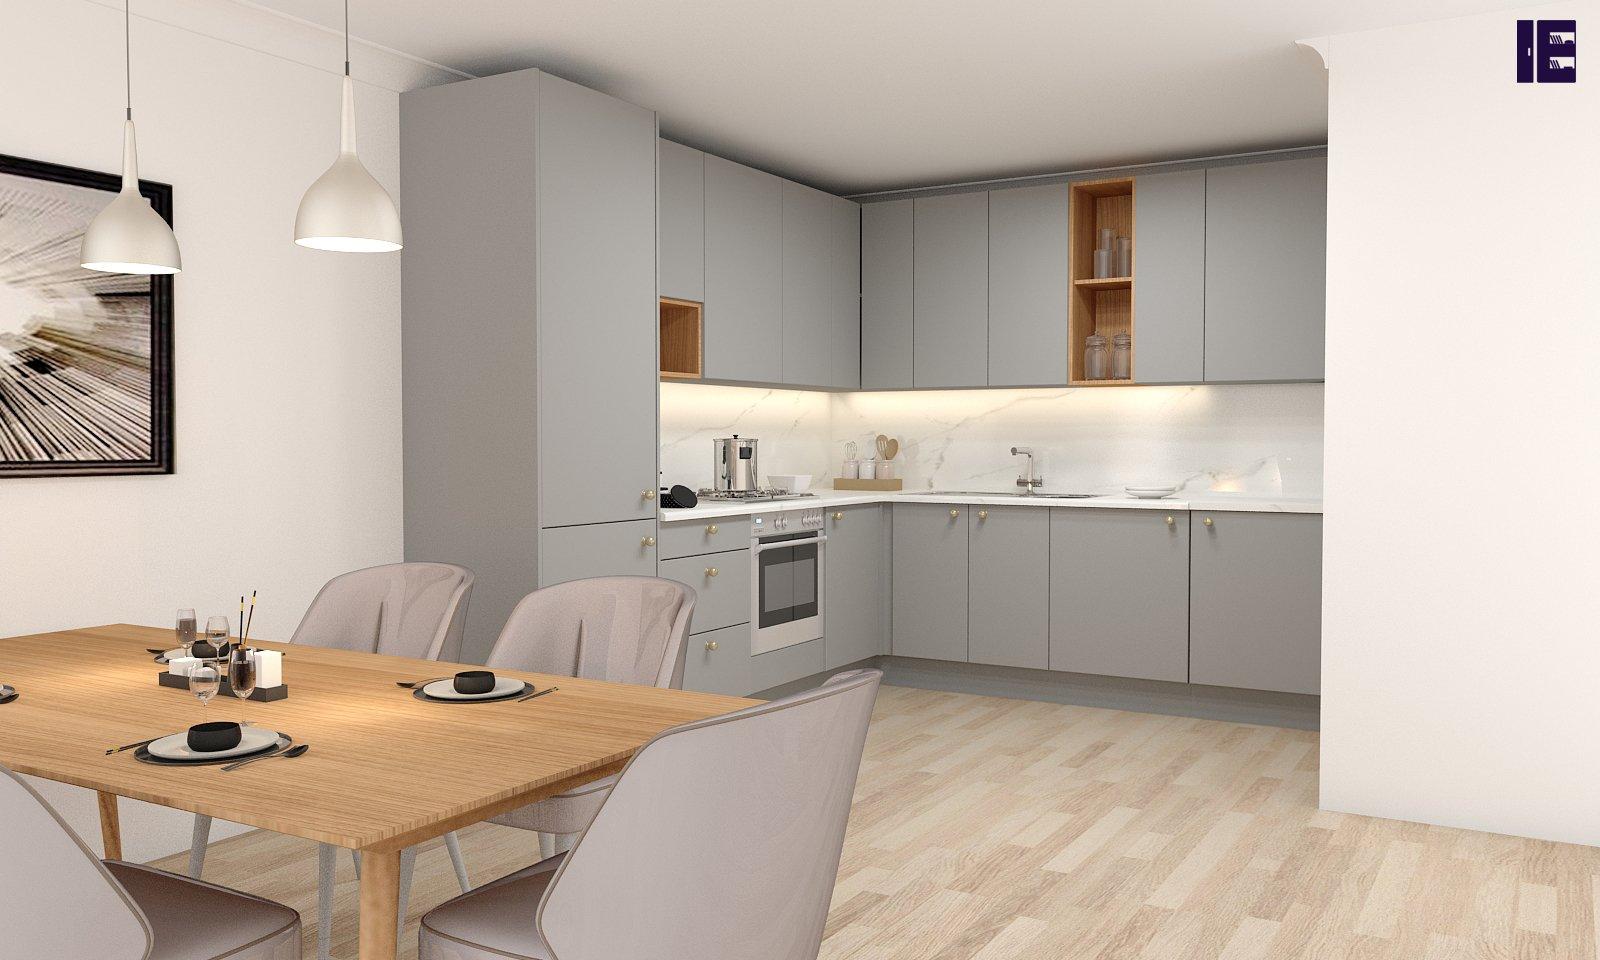 Silver grey kitchen units with verona cherry finish